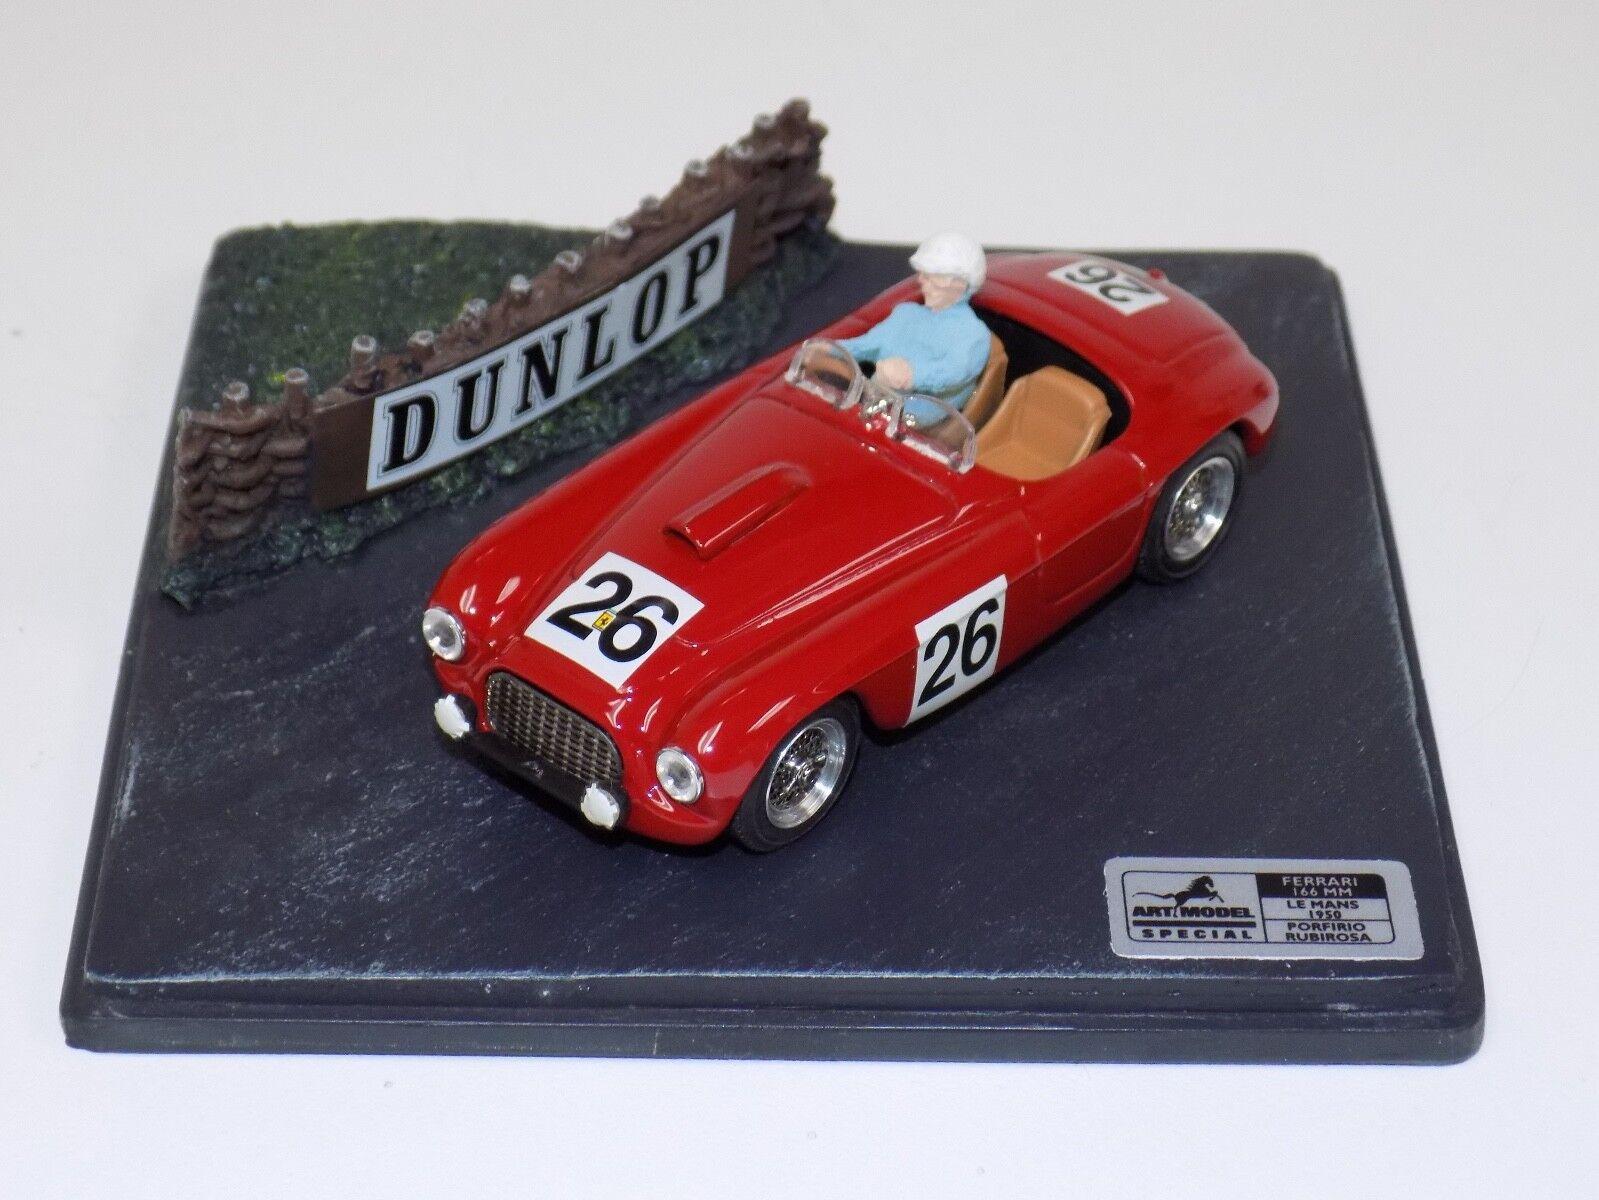 Model Building Skoda Felicia Convertible Red Model 1961 V&v Kat 107 H0 1:87 Original Packaging